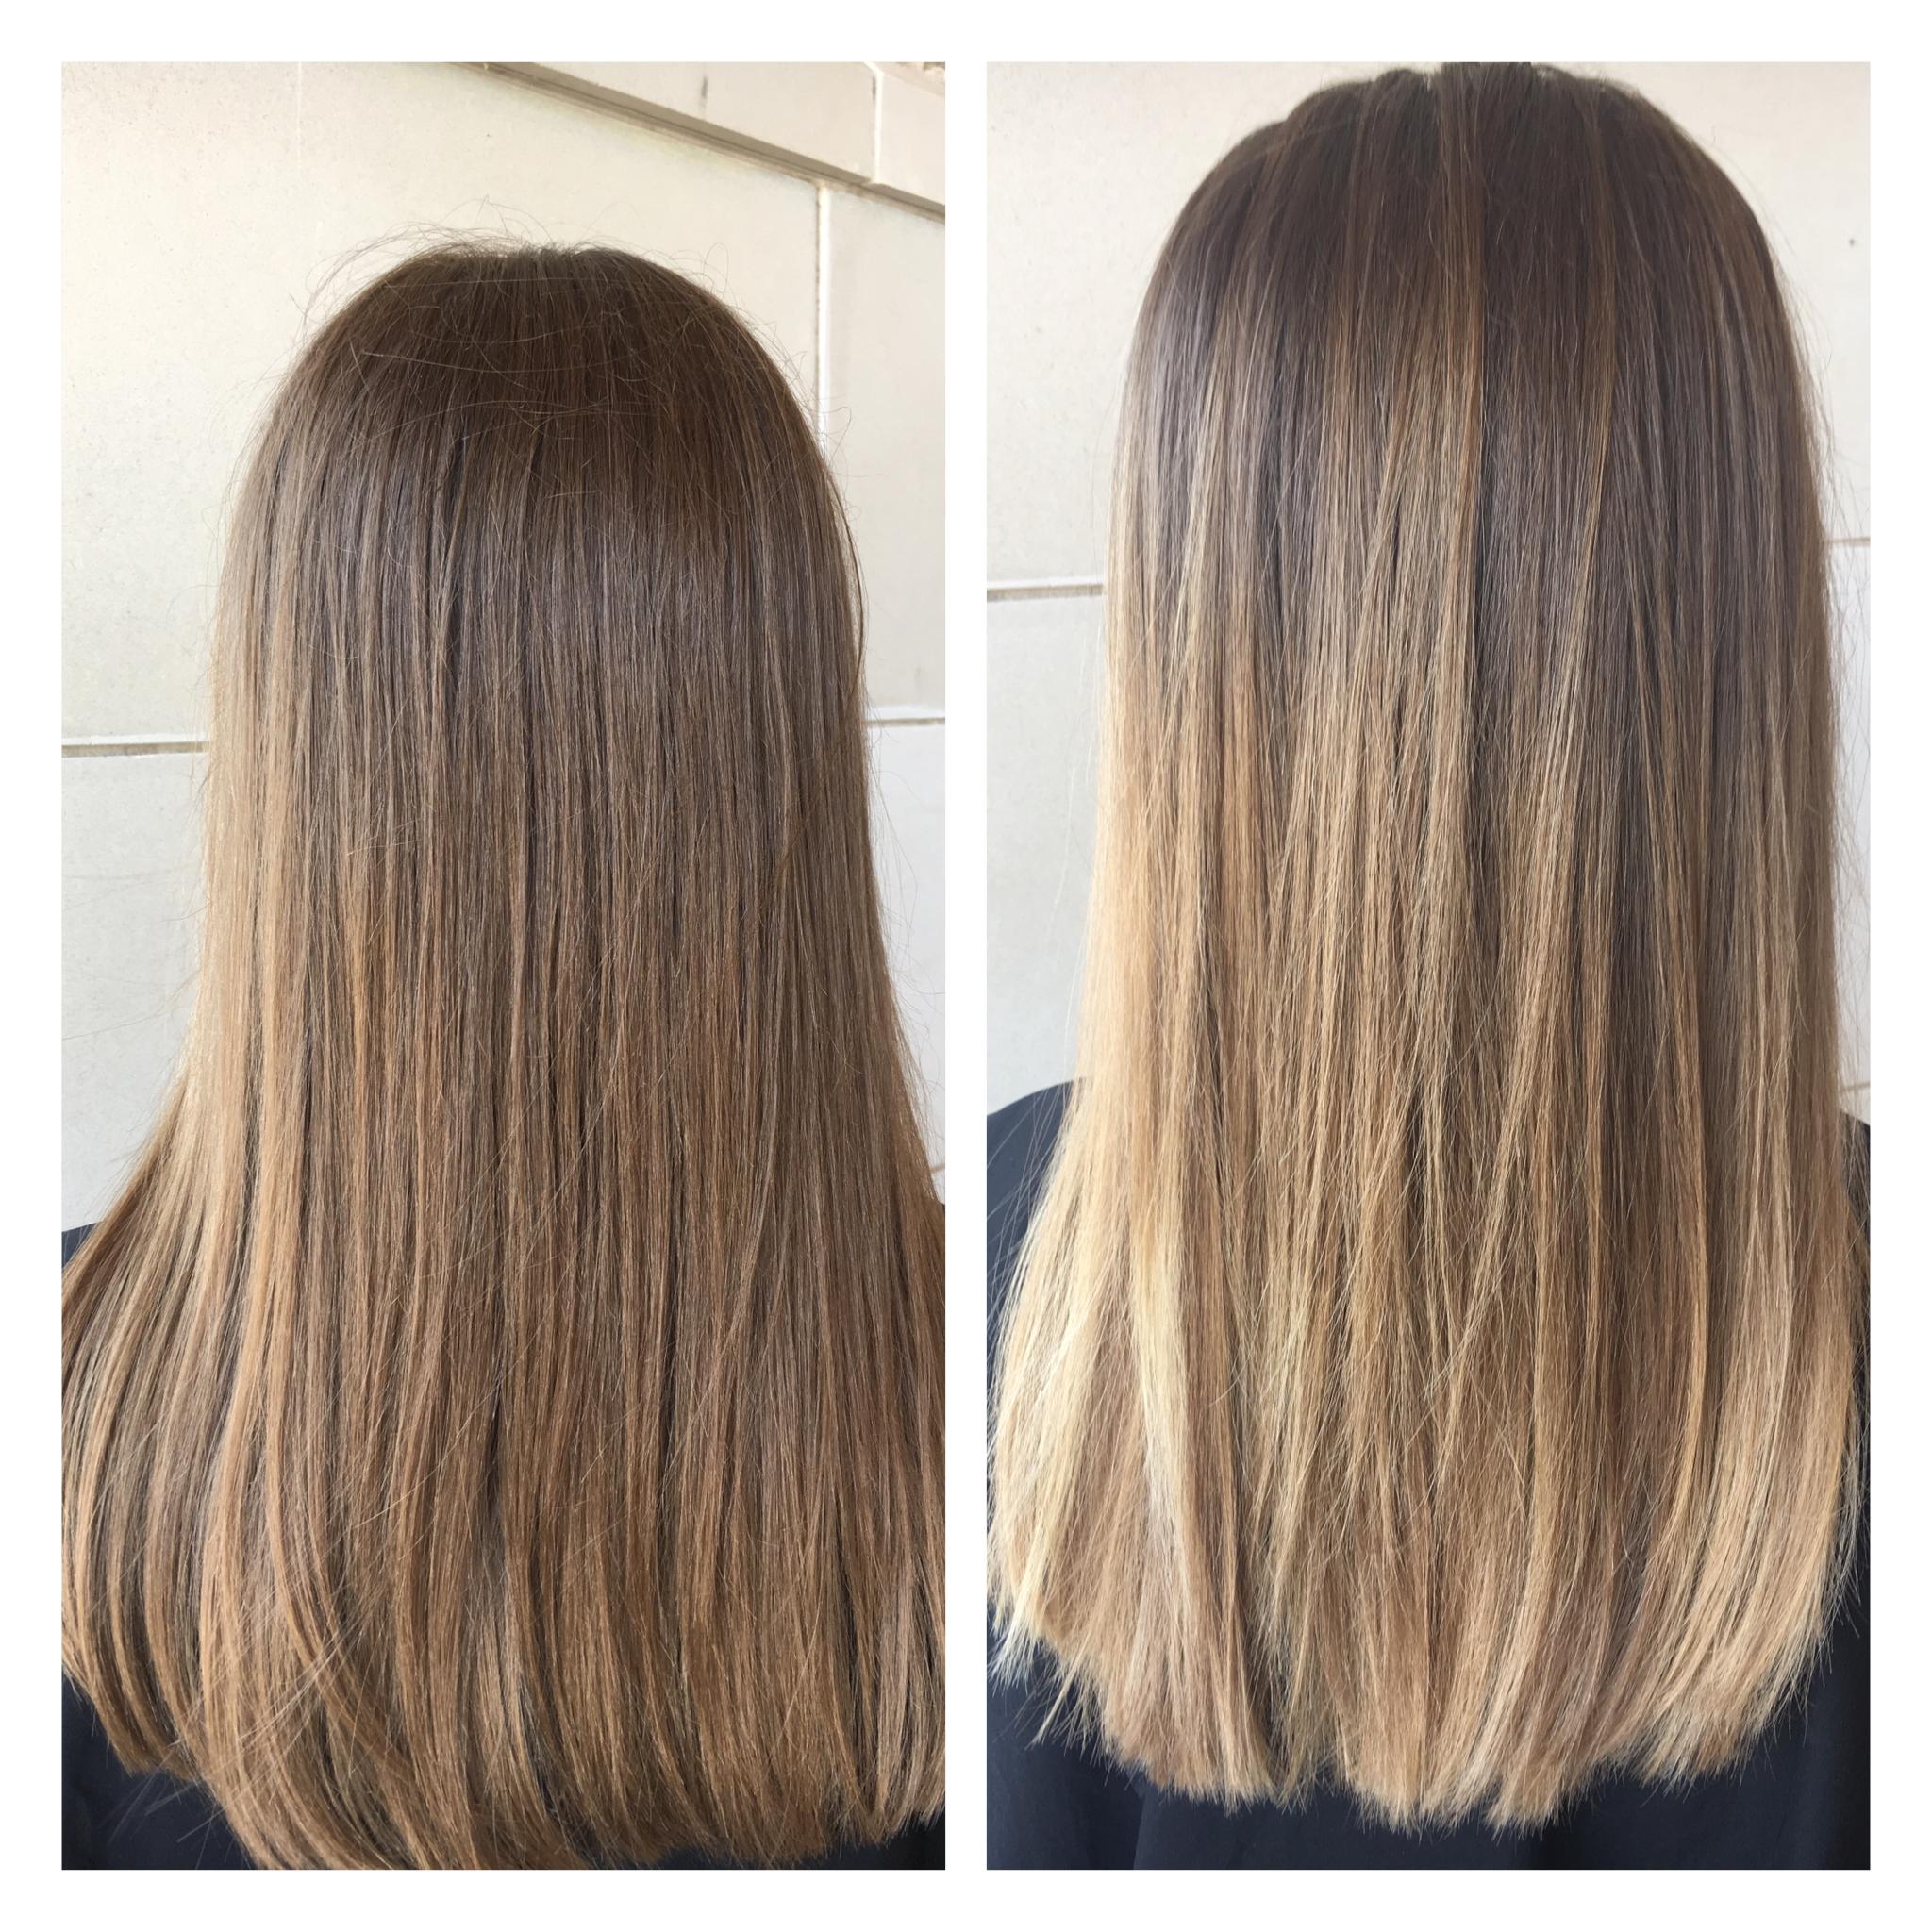 Balayage Light Brown And Blonde Medium Length Hair Brown Hair Balayage Medium Length Hair Styles Hair Color Light Brown